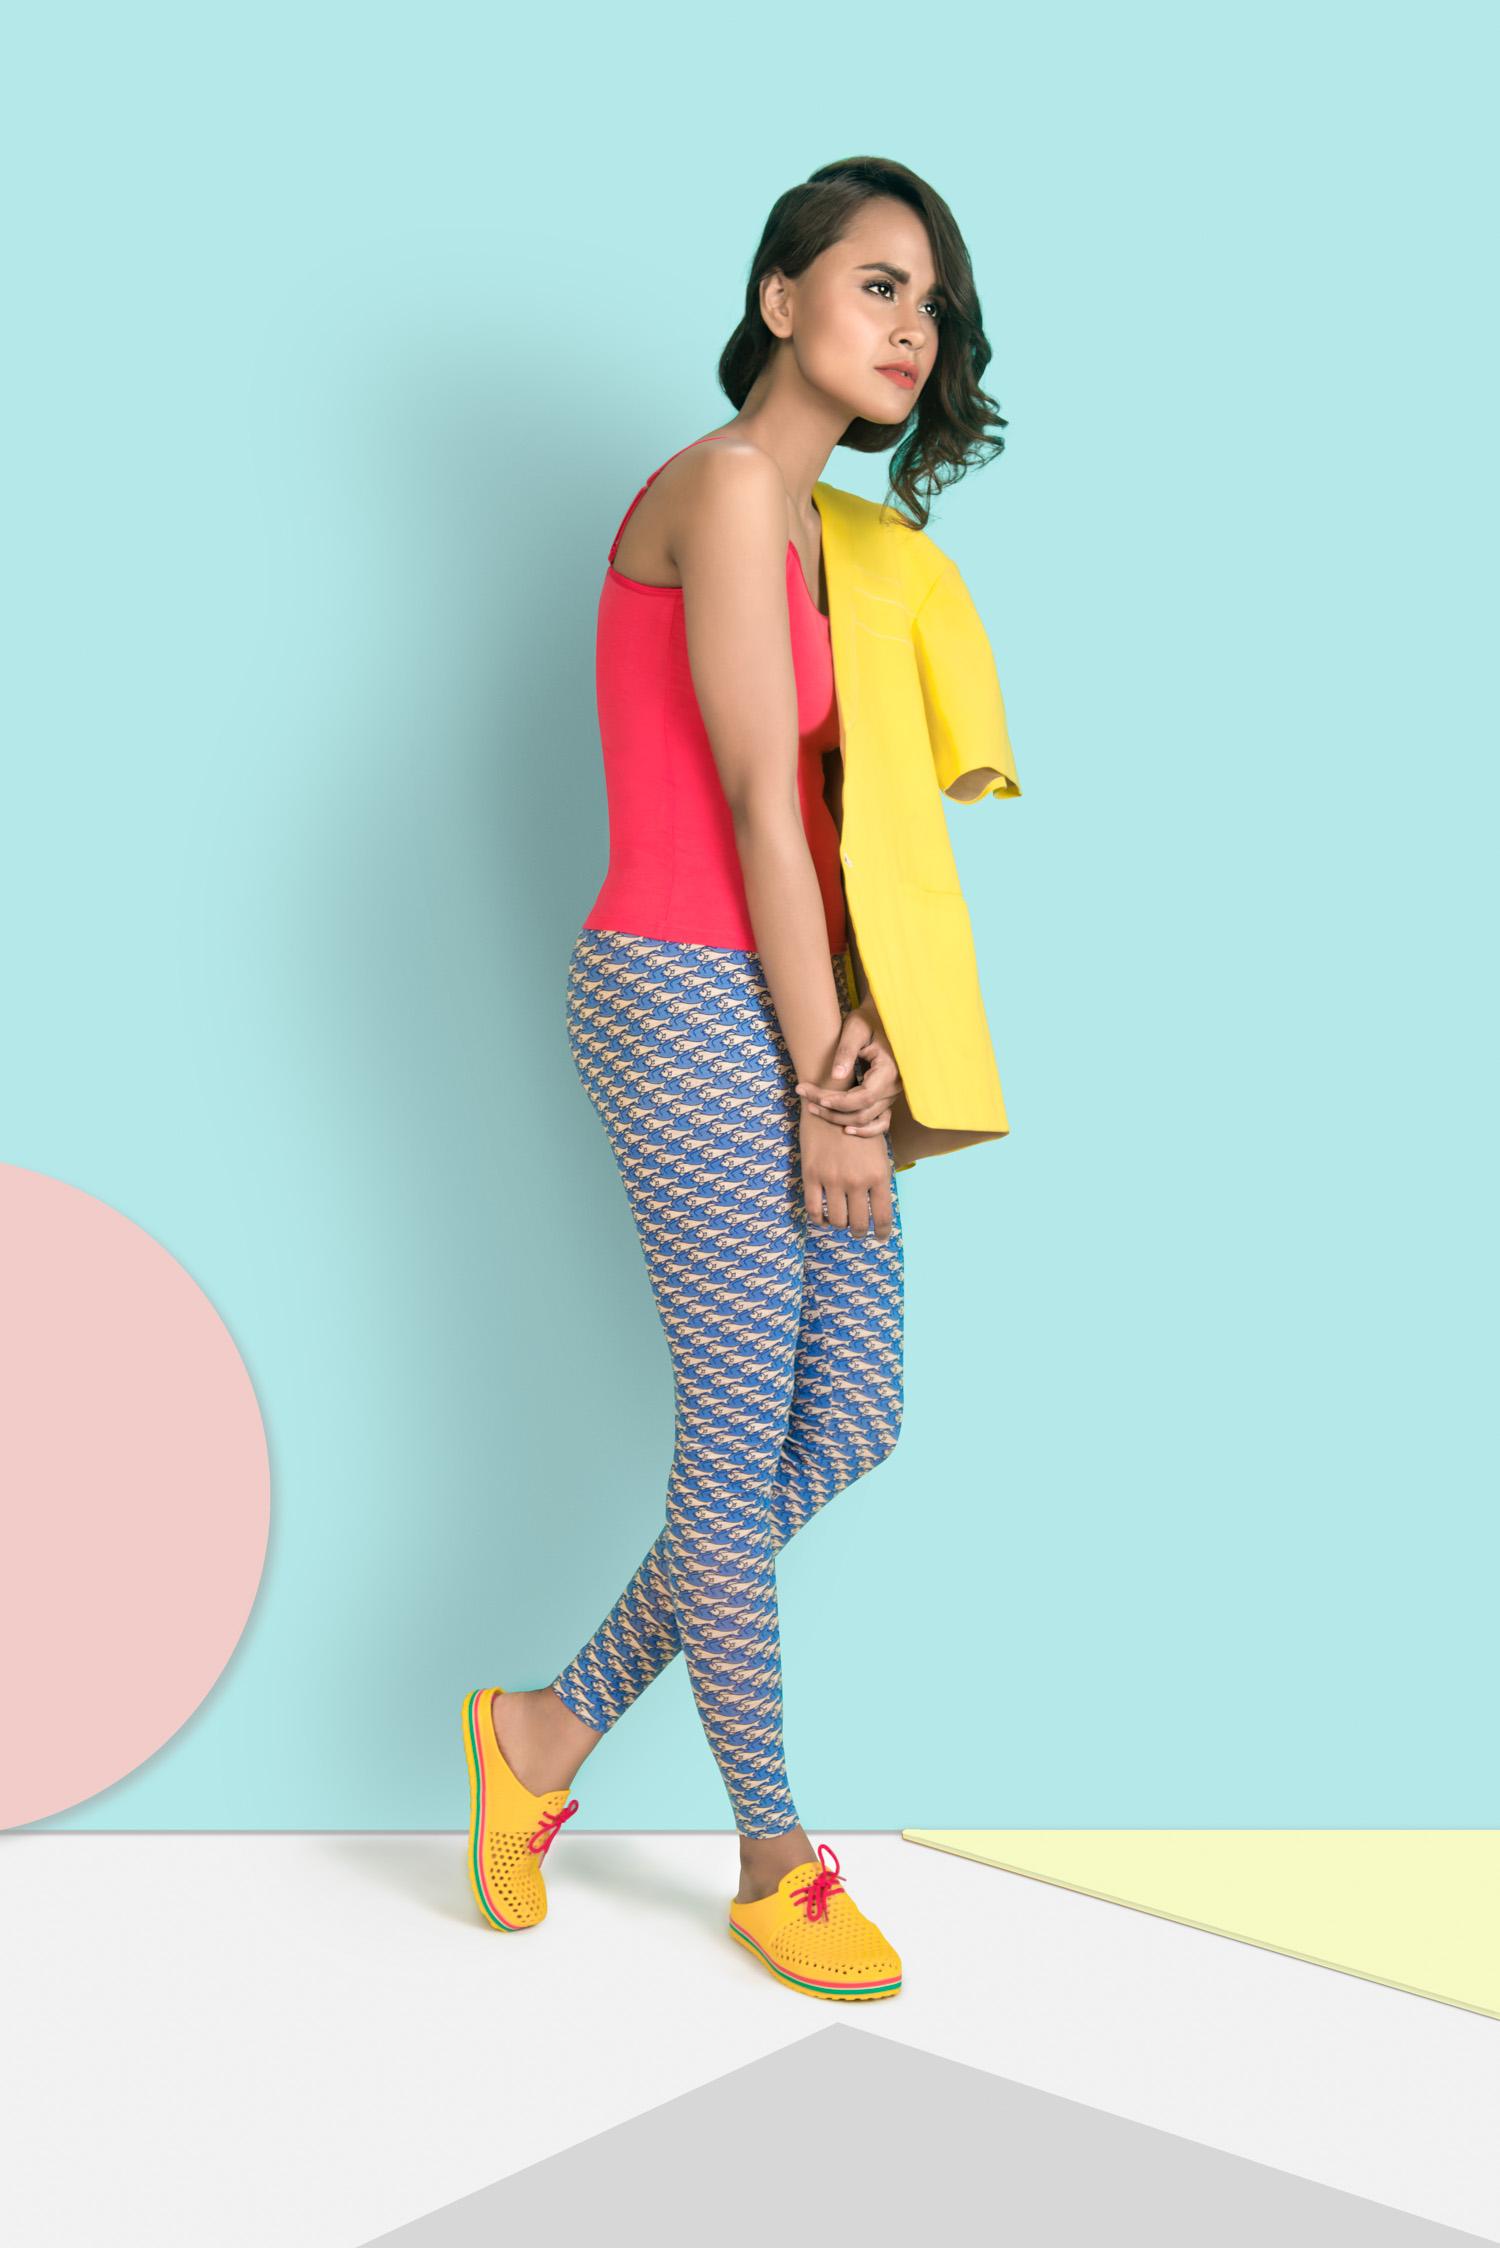 5_Chhandak Pradhan-Fashion-Femorra-Brand Campaign.jpg